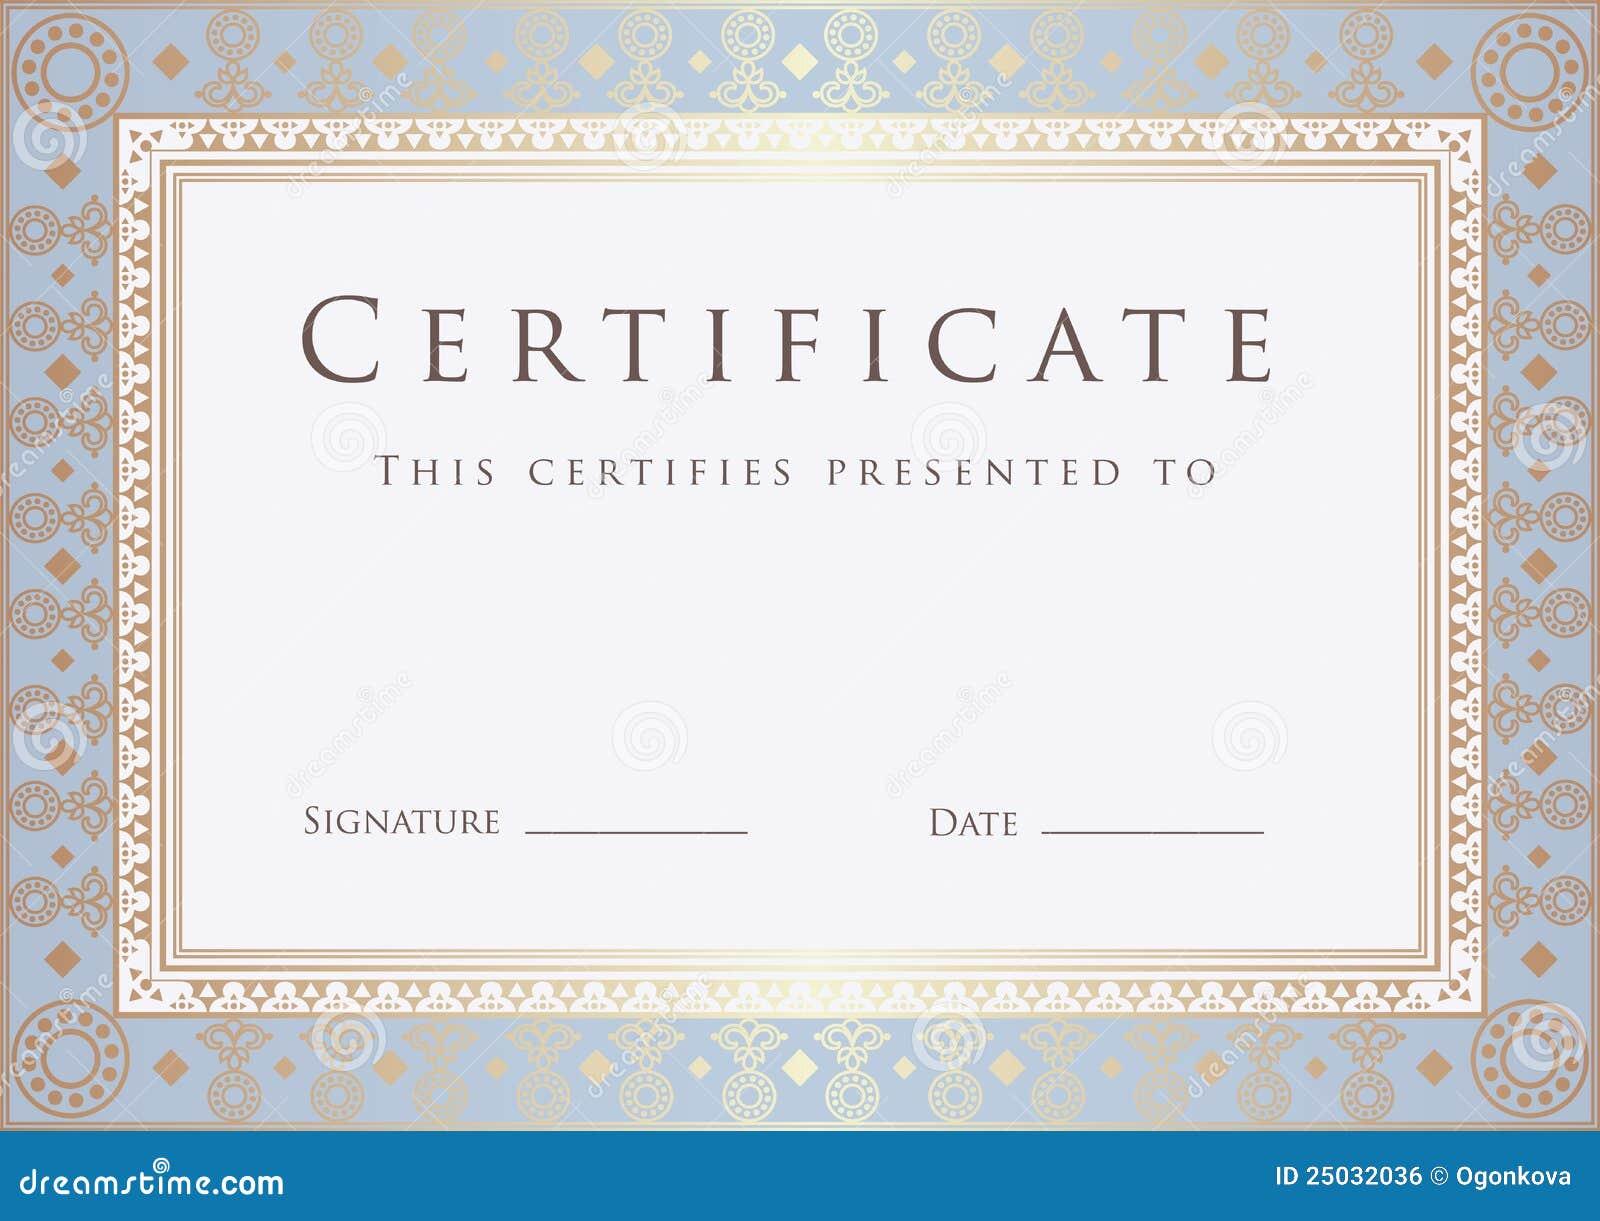 Certificate / Diploma Award Template. Pattern Royalty Free Stock Image ...